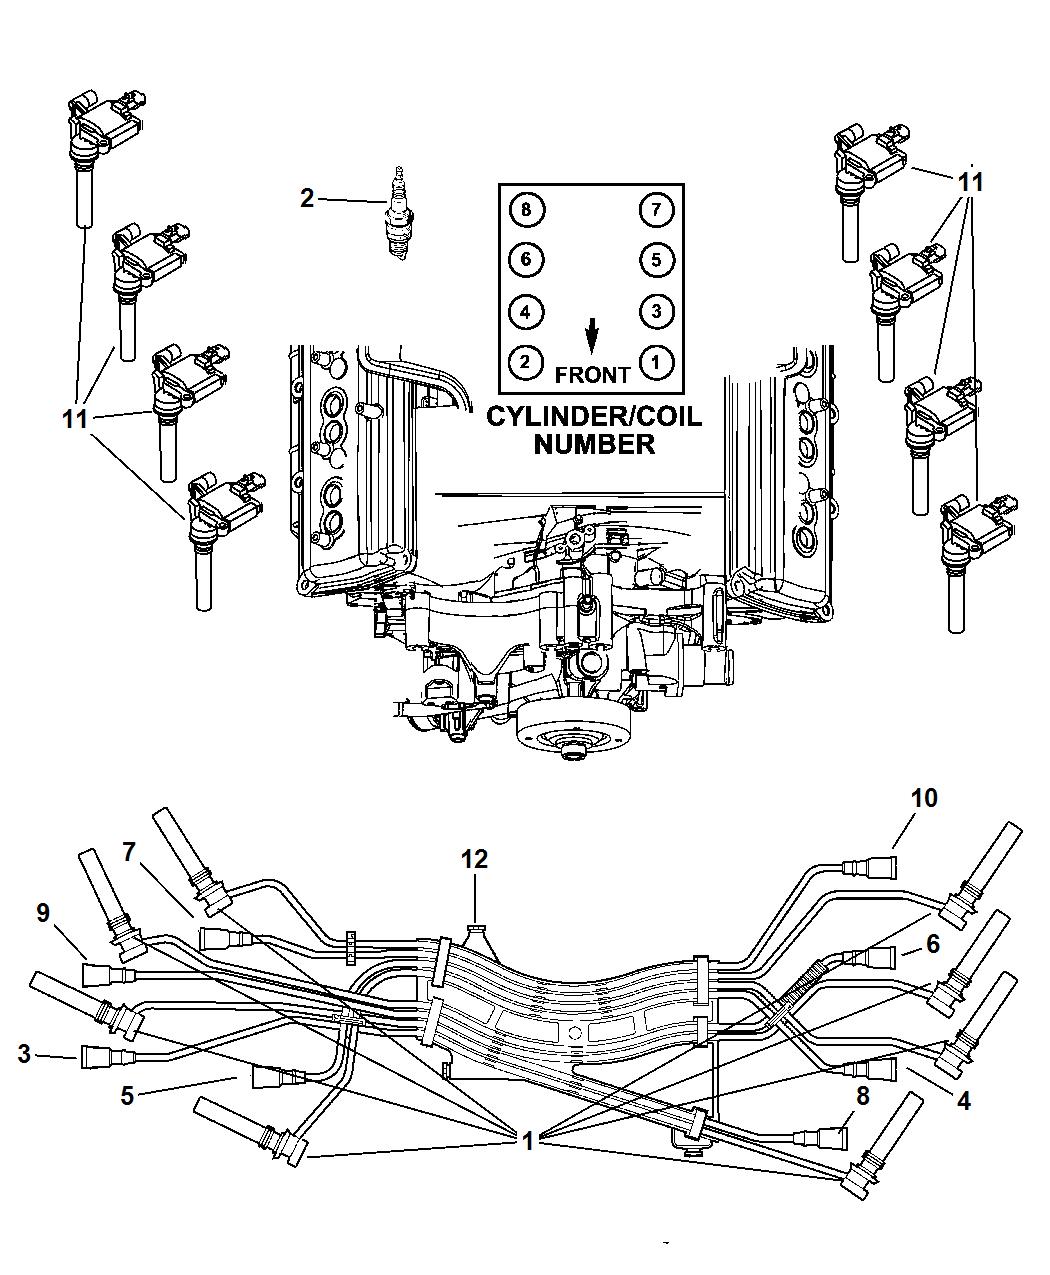 GL_6102] 2004 Durango Spark Plug Diagram Download DiagramWww Mohammedshrine Librar Wiring 101